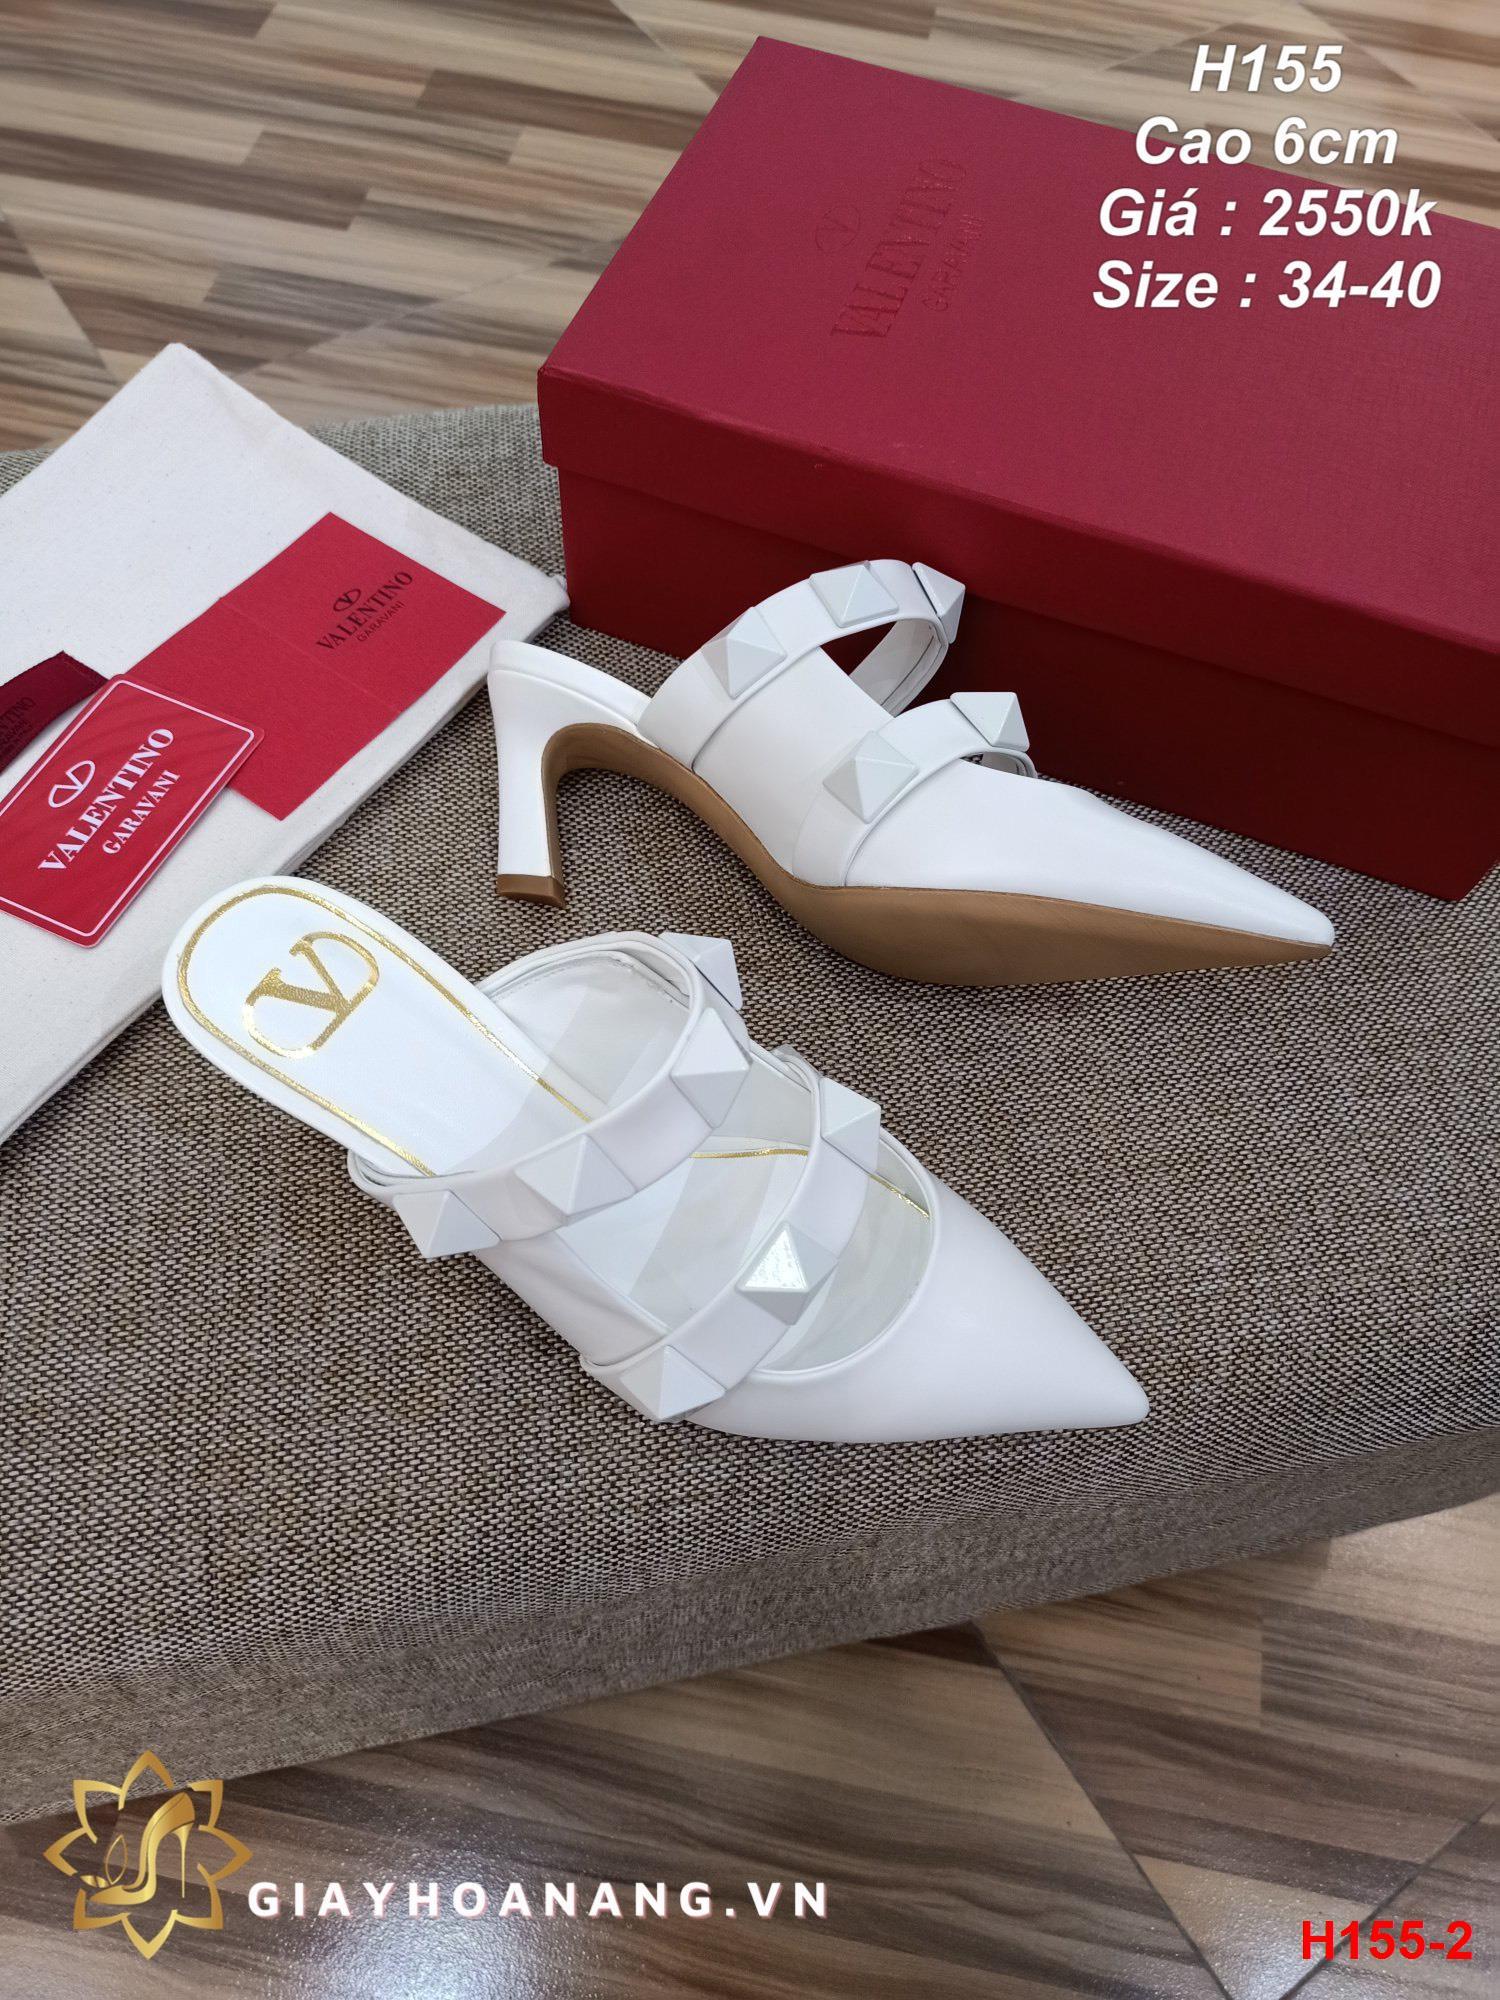 H155-2 Valentino sandal cao 6cm siêu cấp